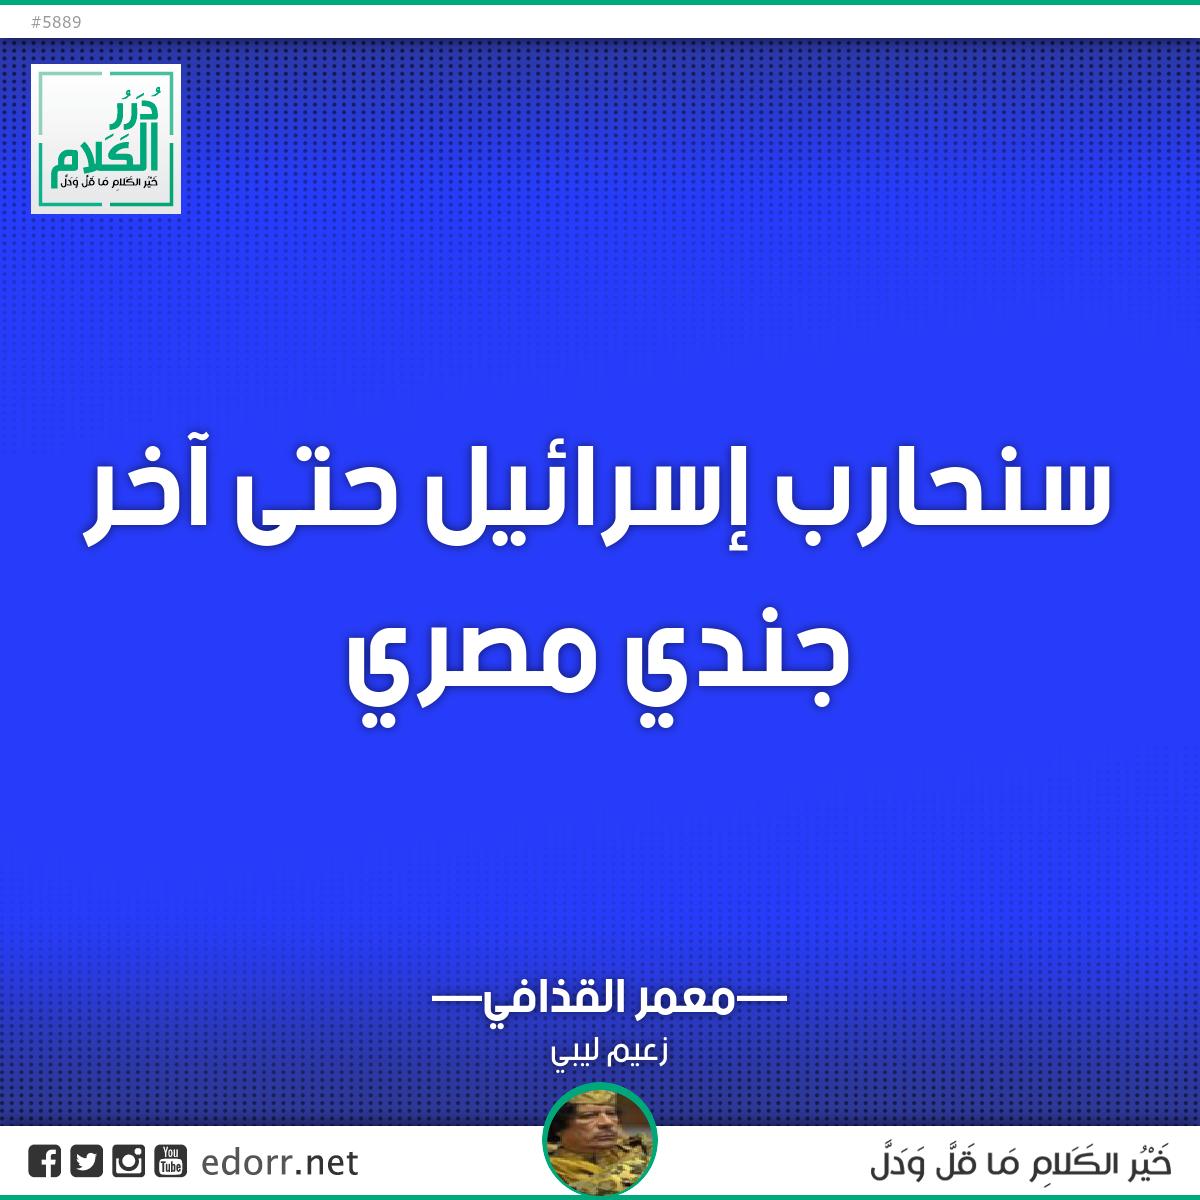 سنحارب إسرائيل حتى آخر جندي مصري.